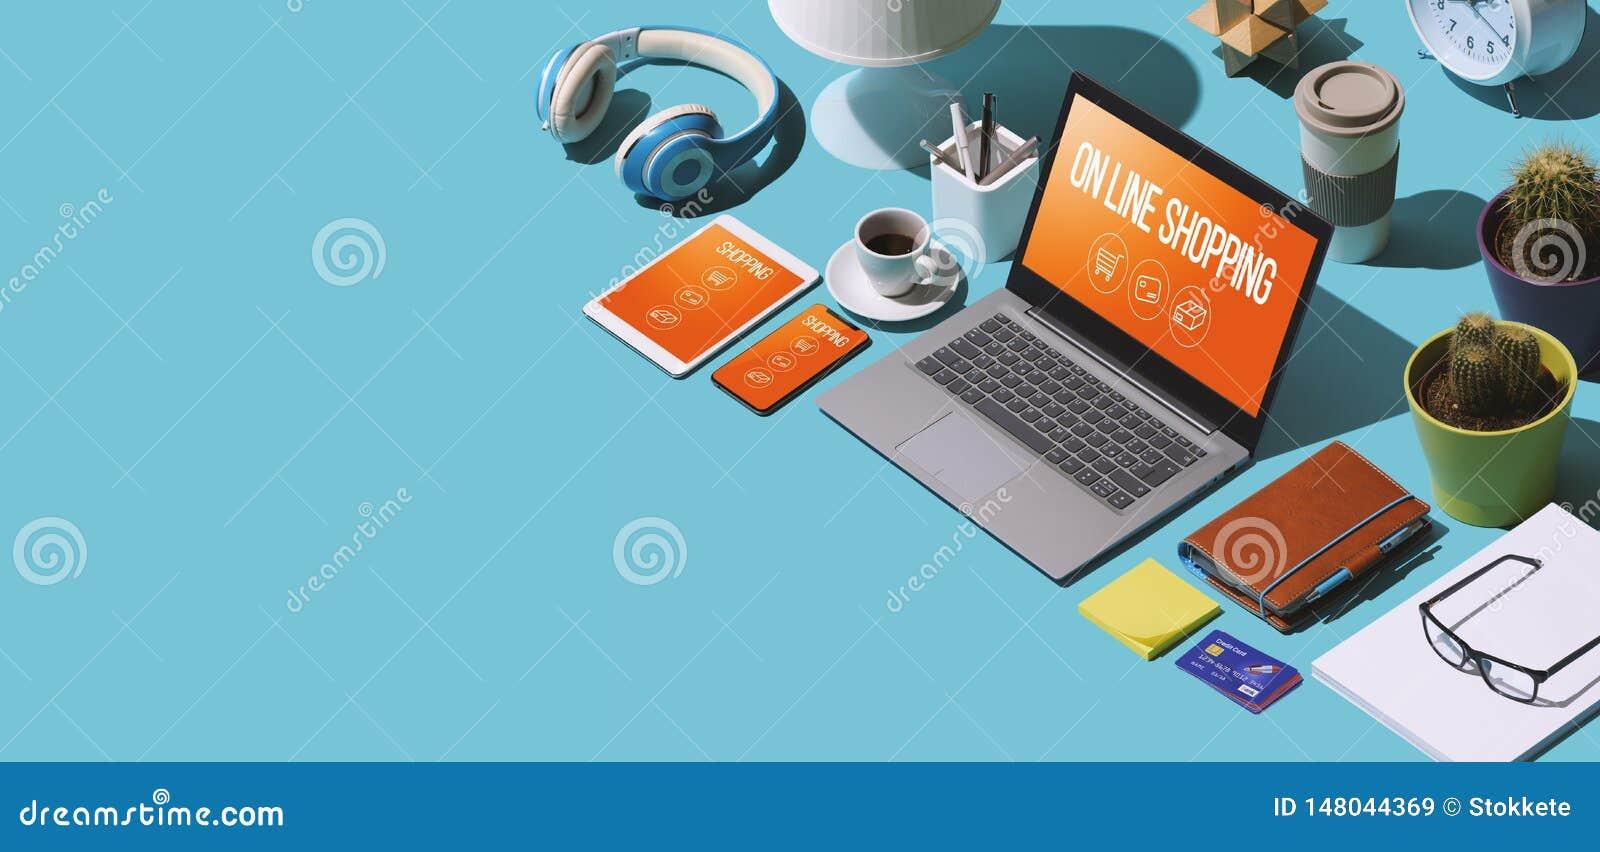 On-line ψωνίζοντας apps στο lap-top και τις κινητές συσκευές